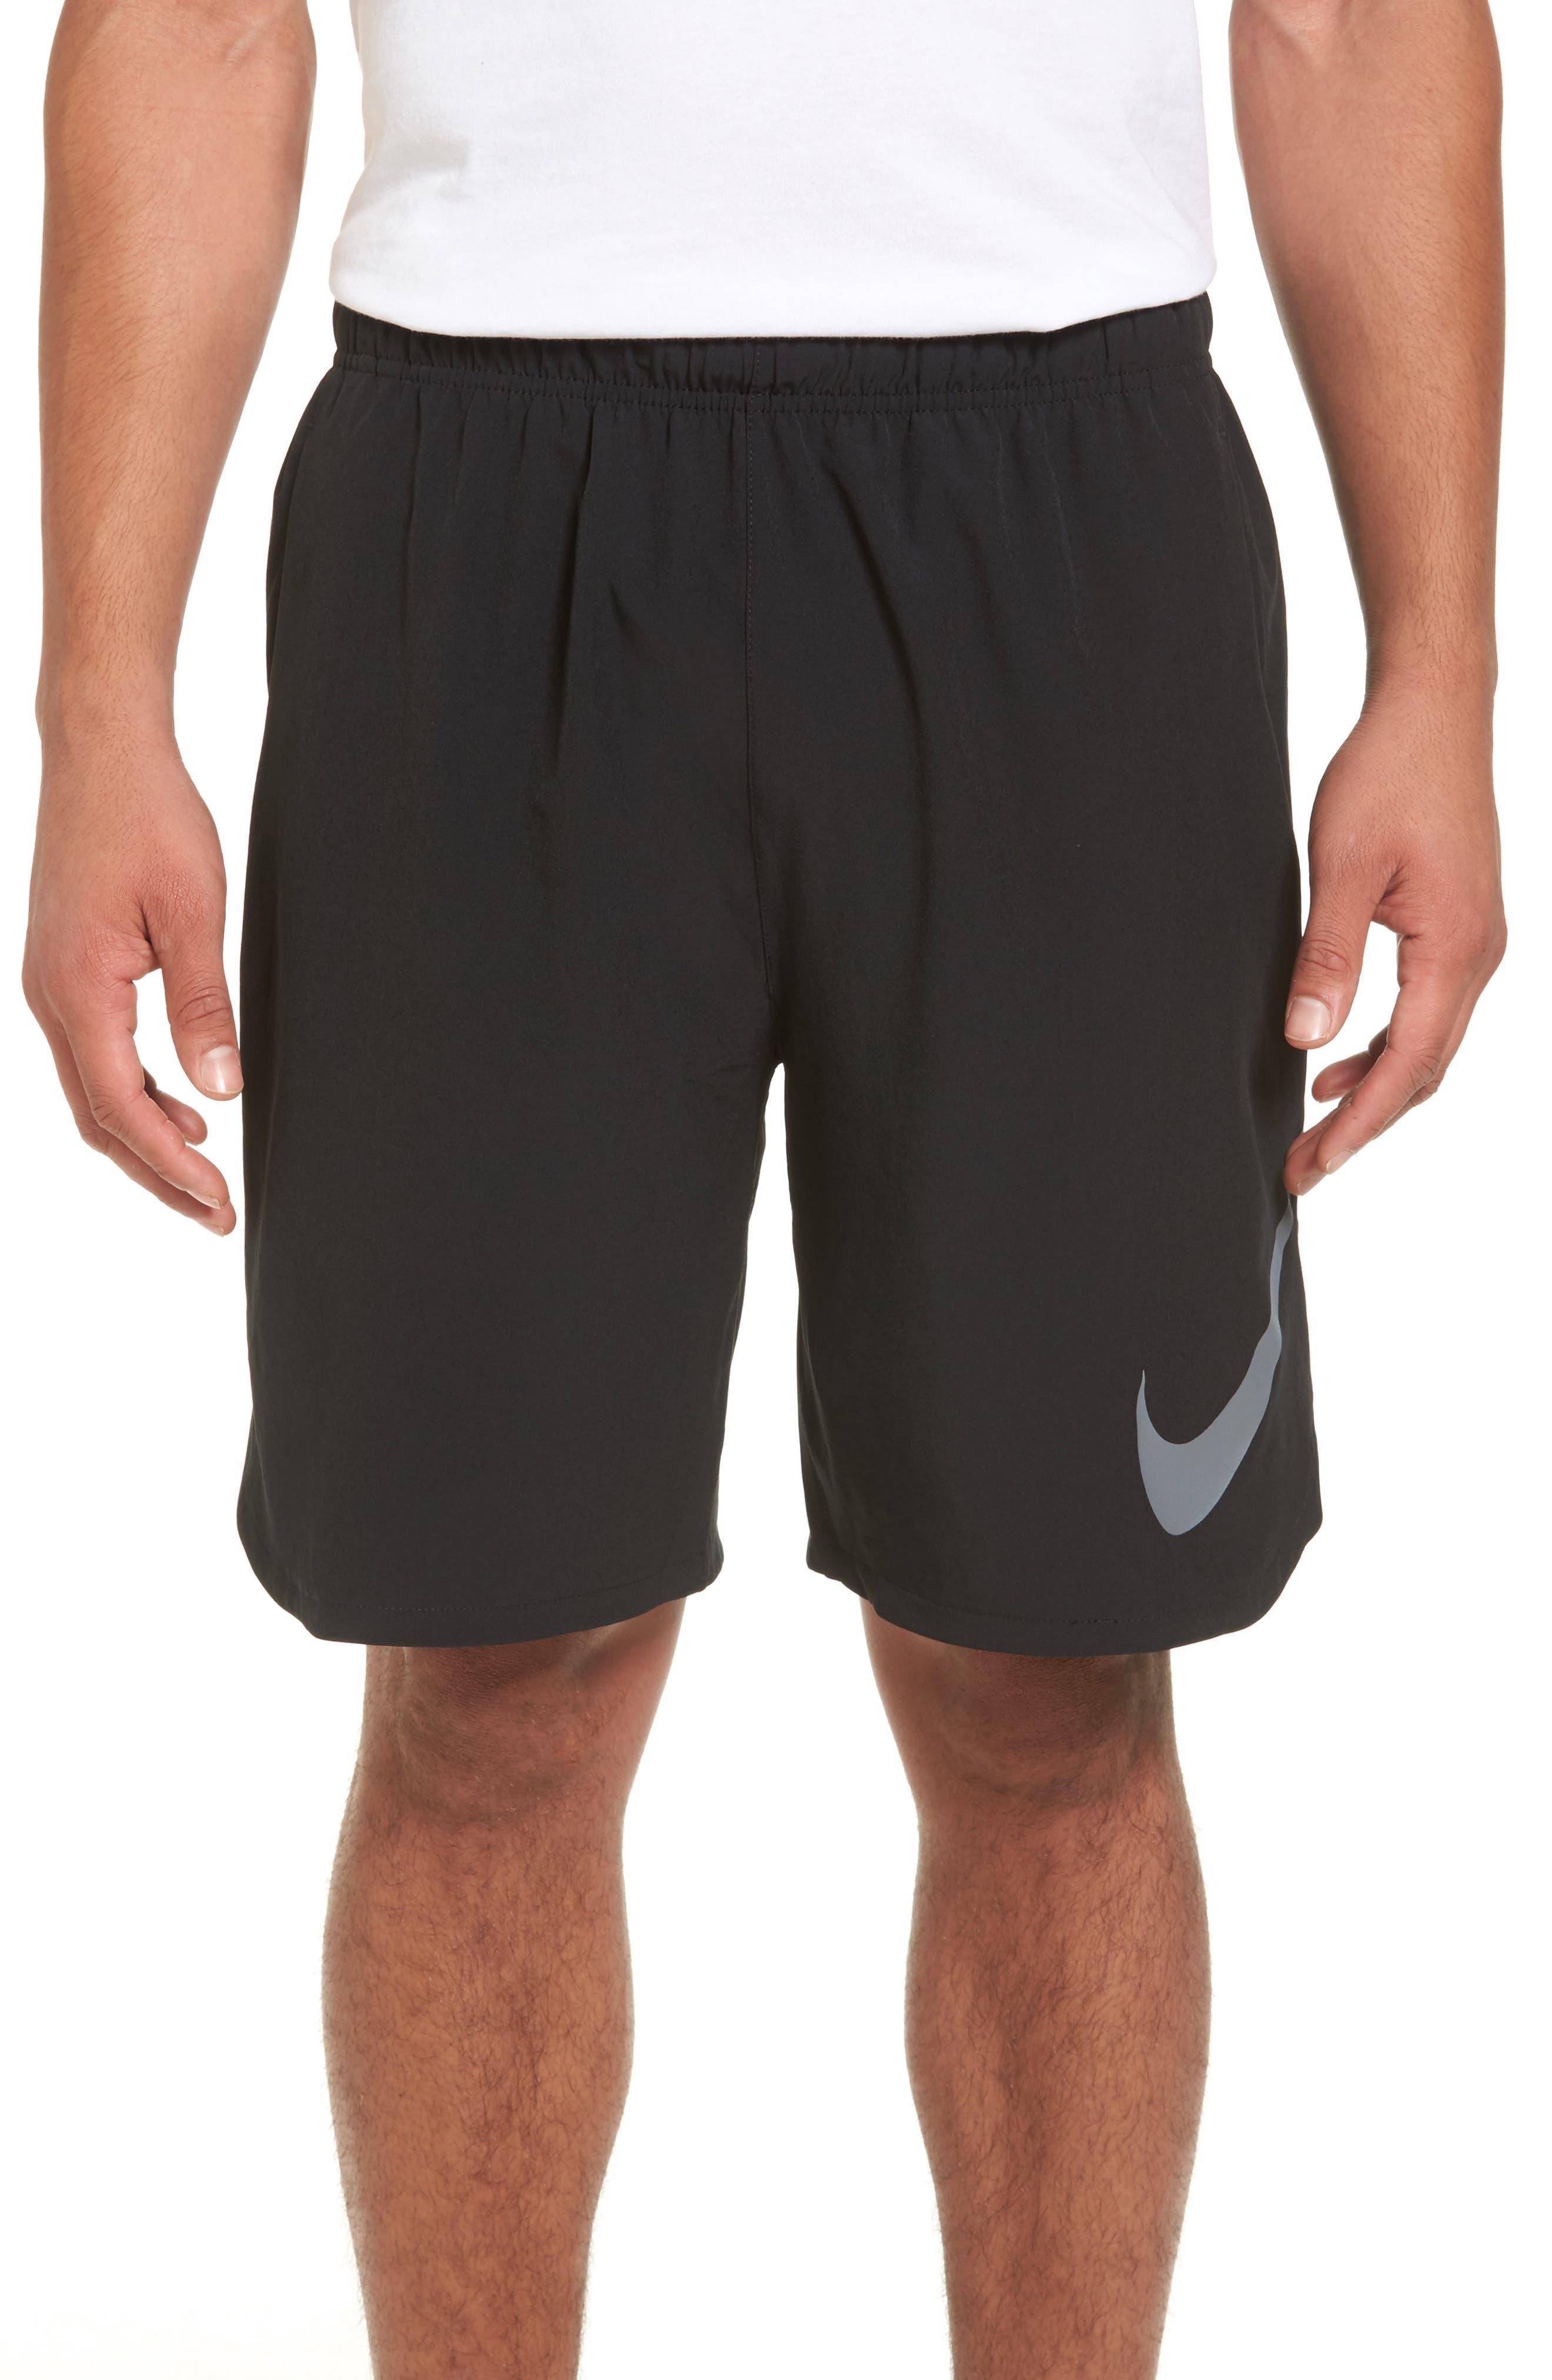 Flex Training Shorts,                         Main,                         color, Black/ Cool Grey